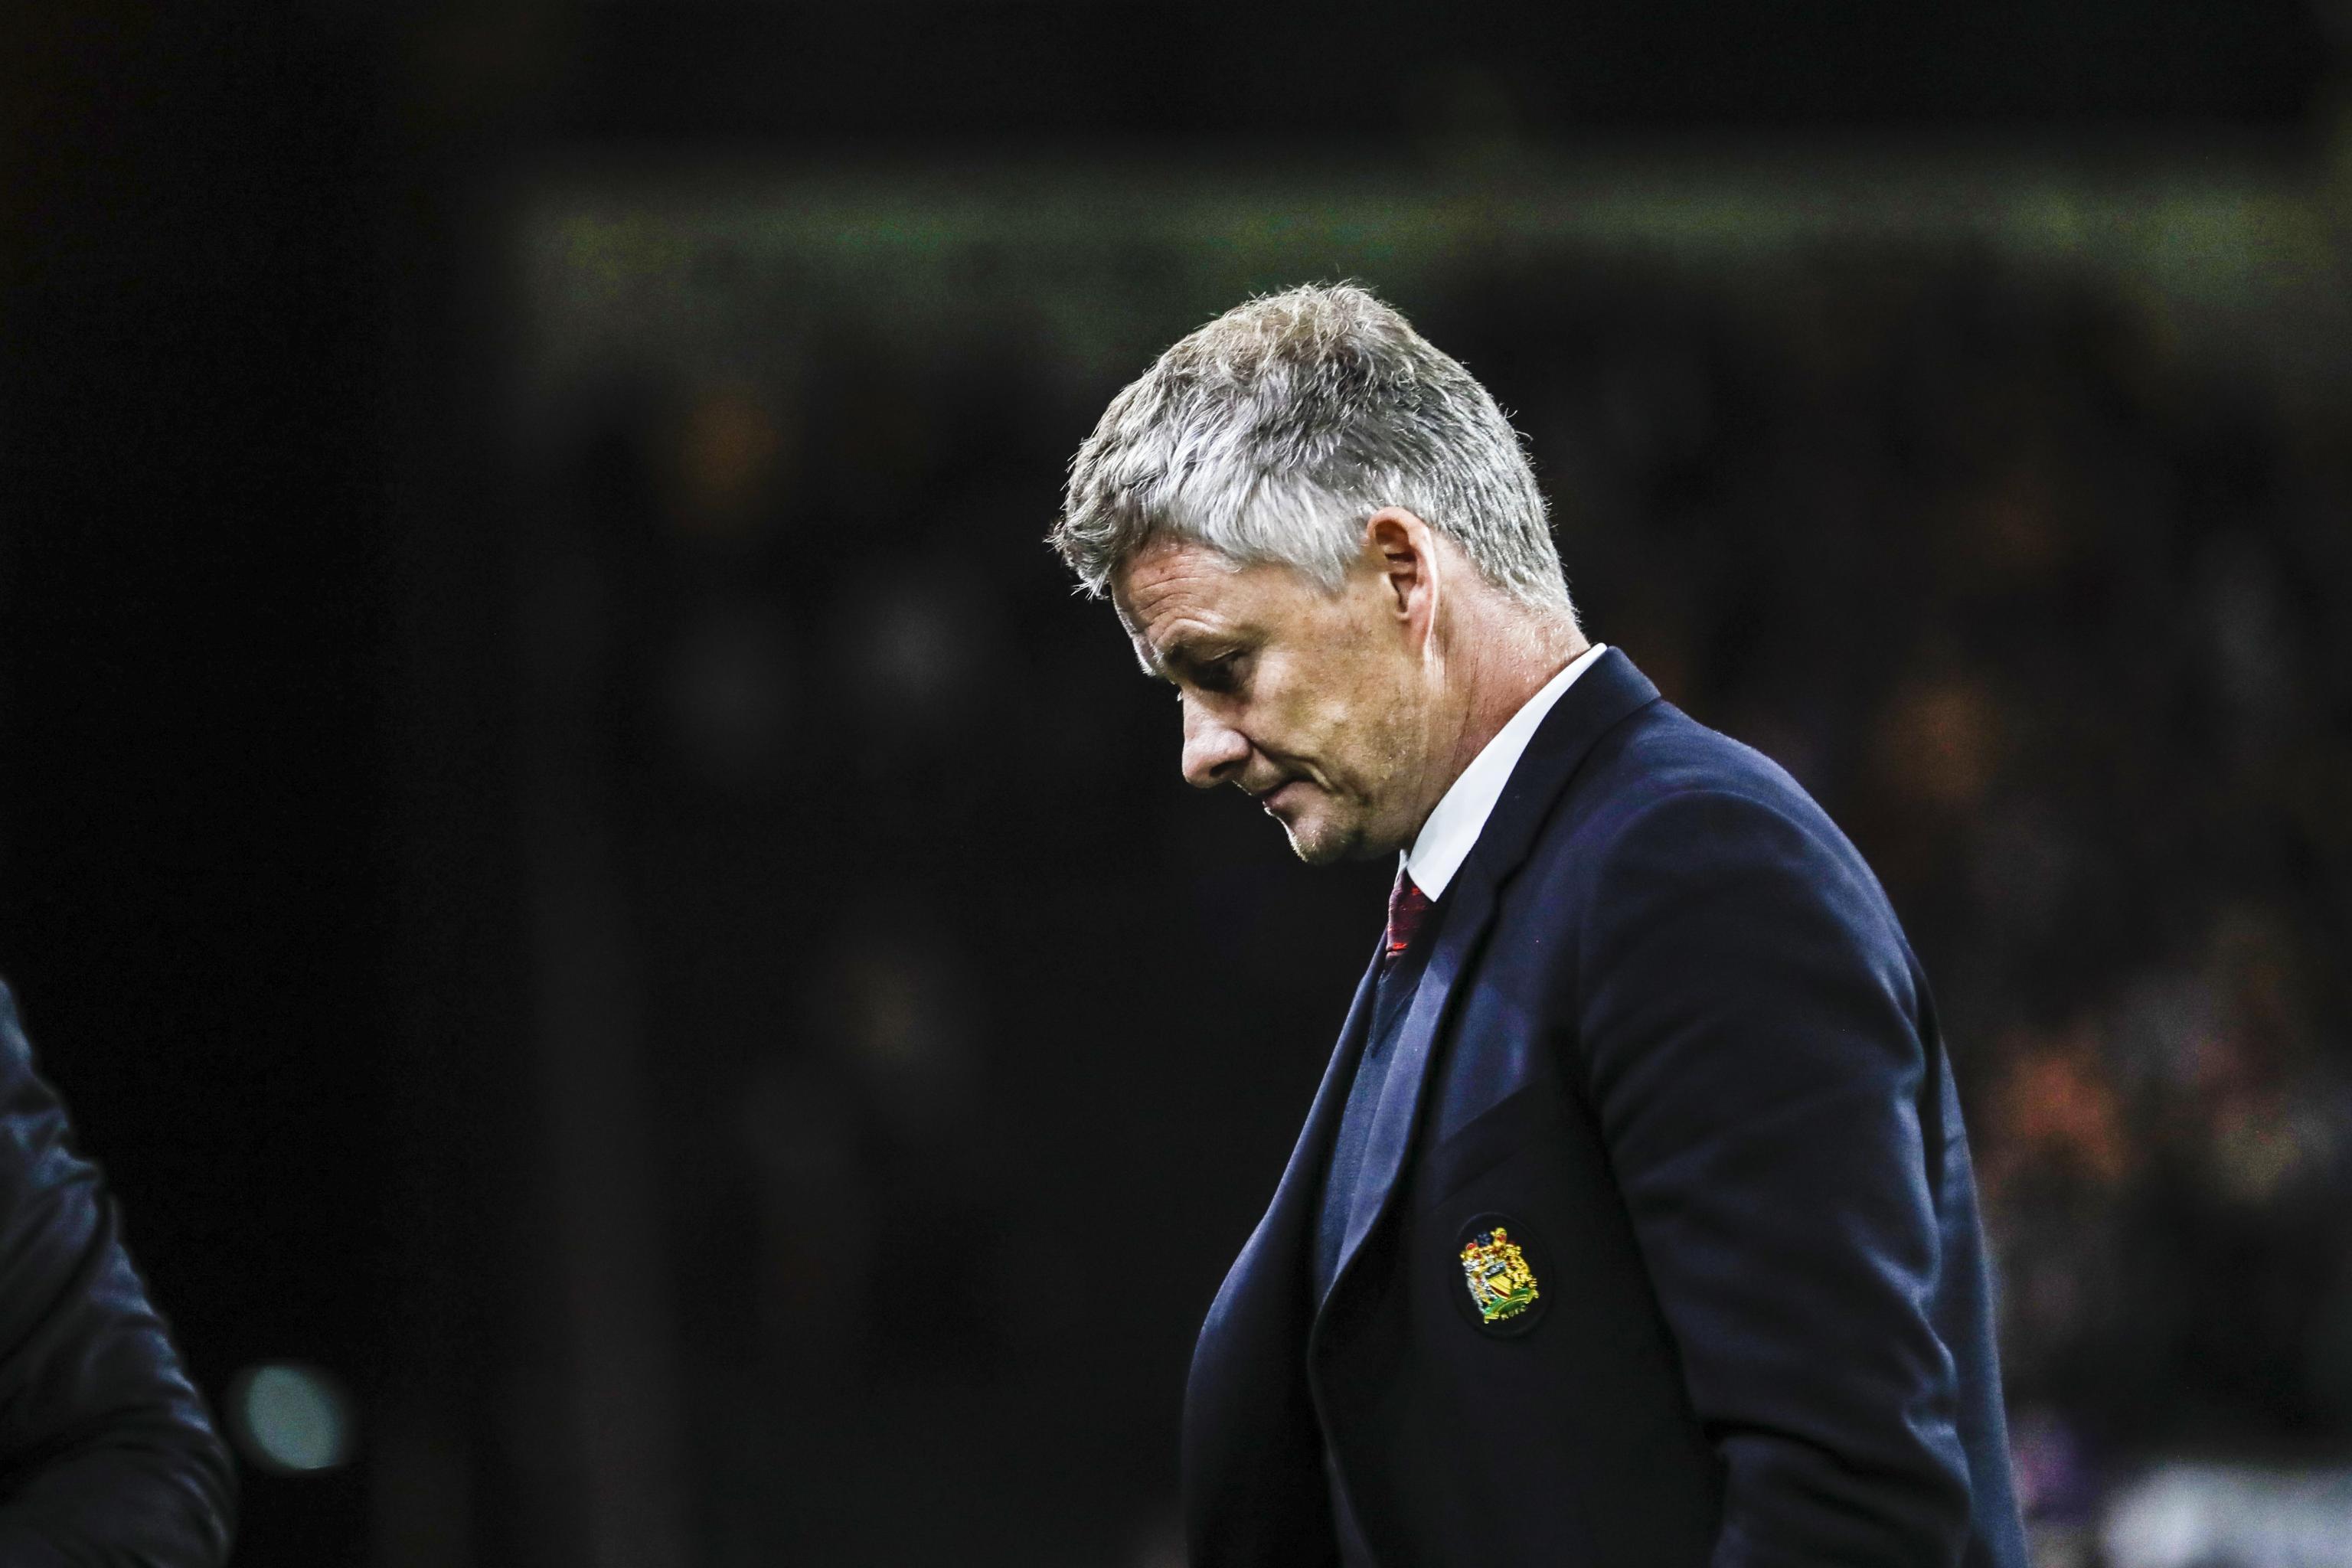 Is Ole Gunnar Solskjaer's Job Already Under Threat at Manchester United